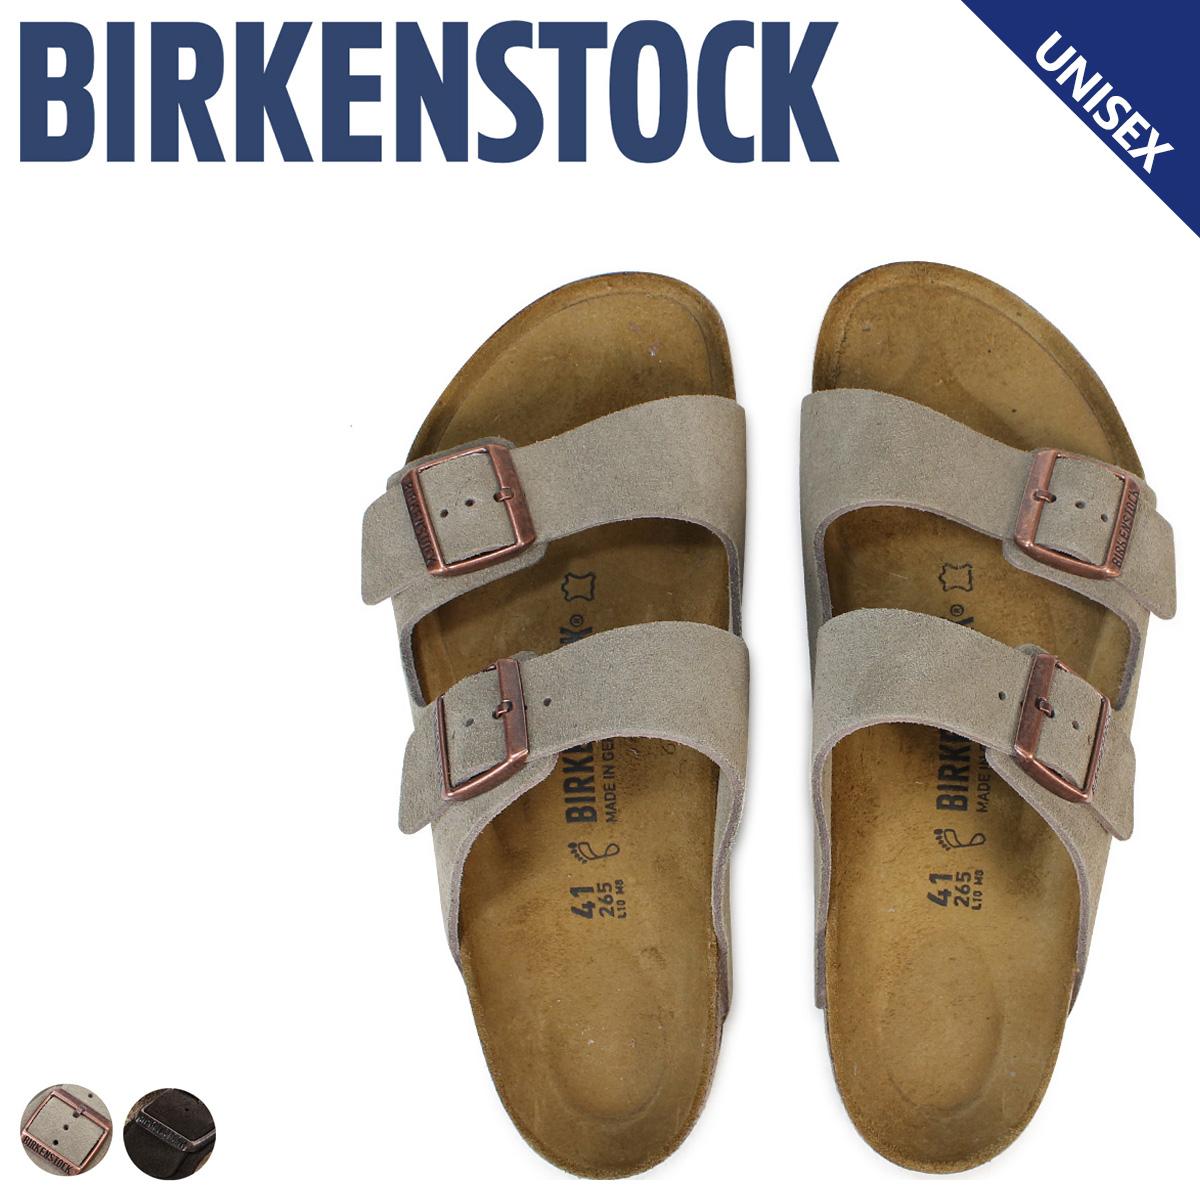 BIRKENSTOCK アリゾナ メンズ レディース ビルケンシュトック ARIZONA ビルケン サンダル 普通幅 細幅 スエード